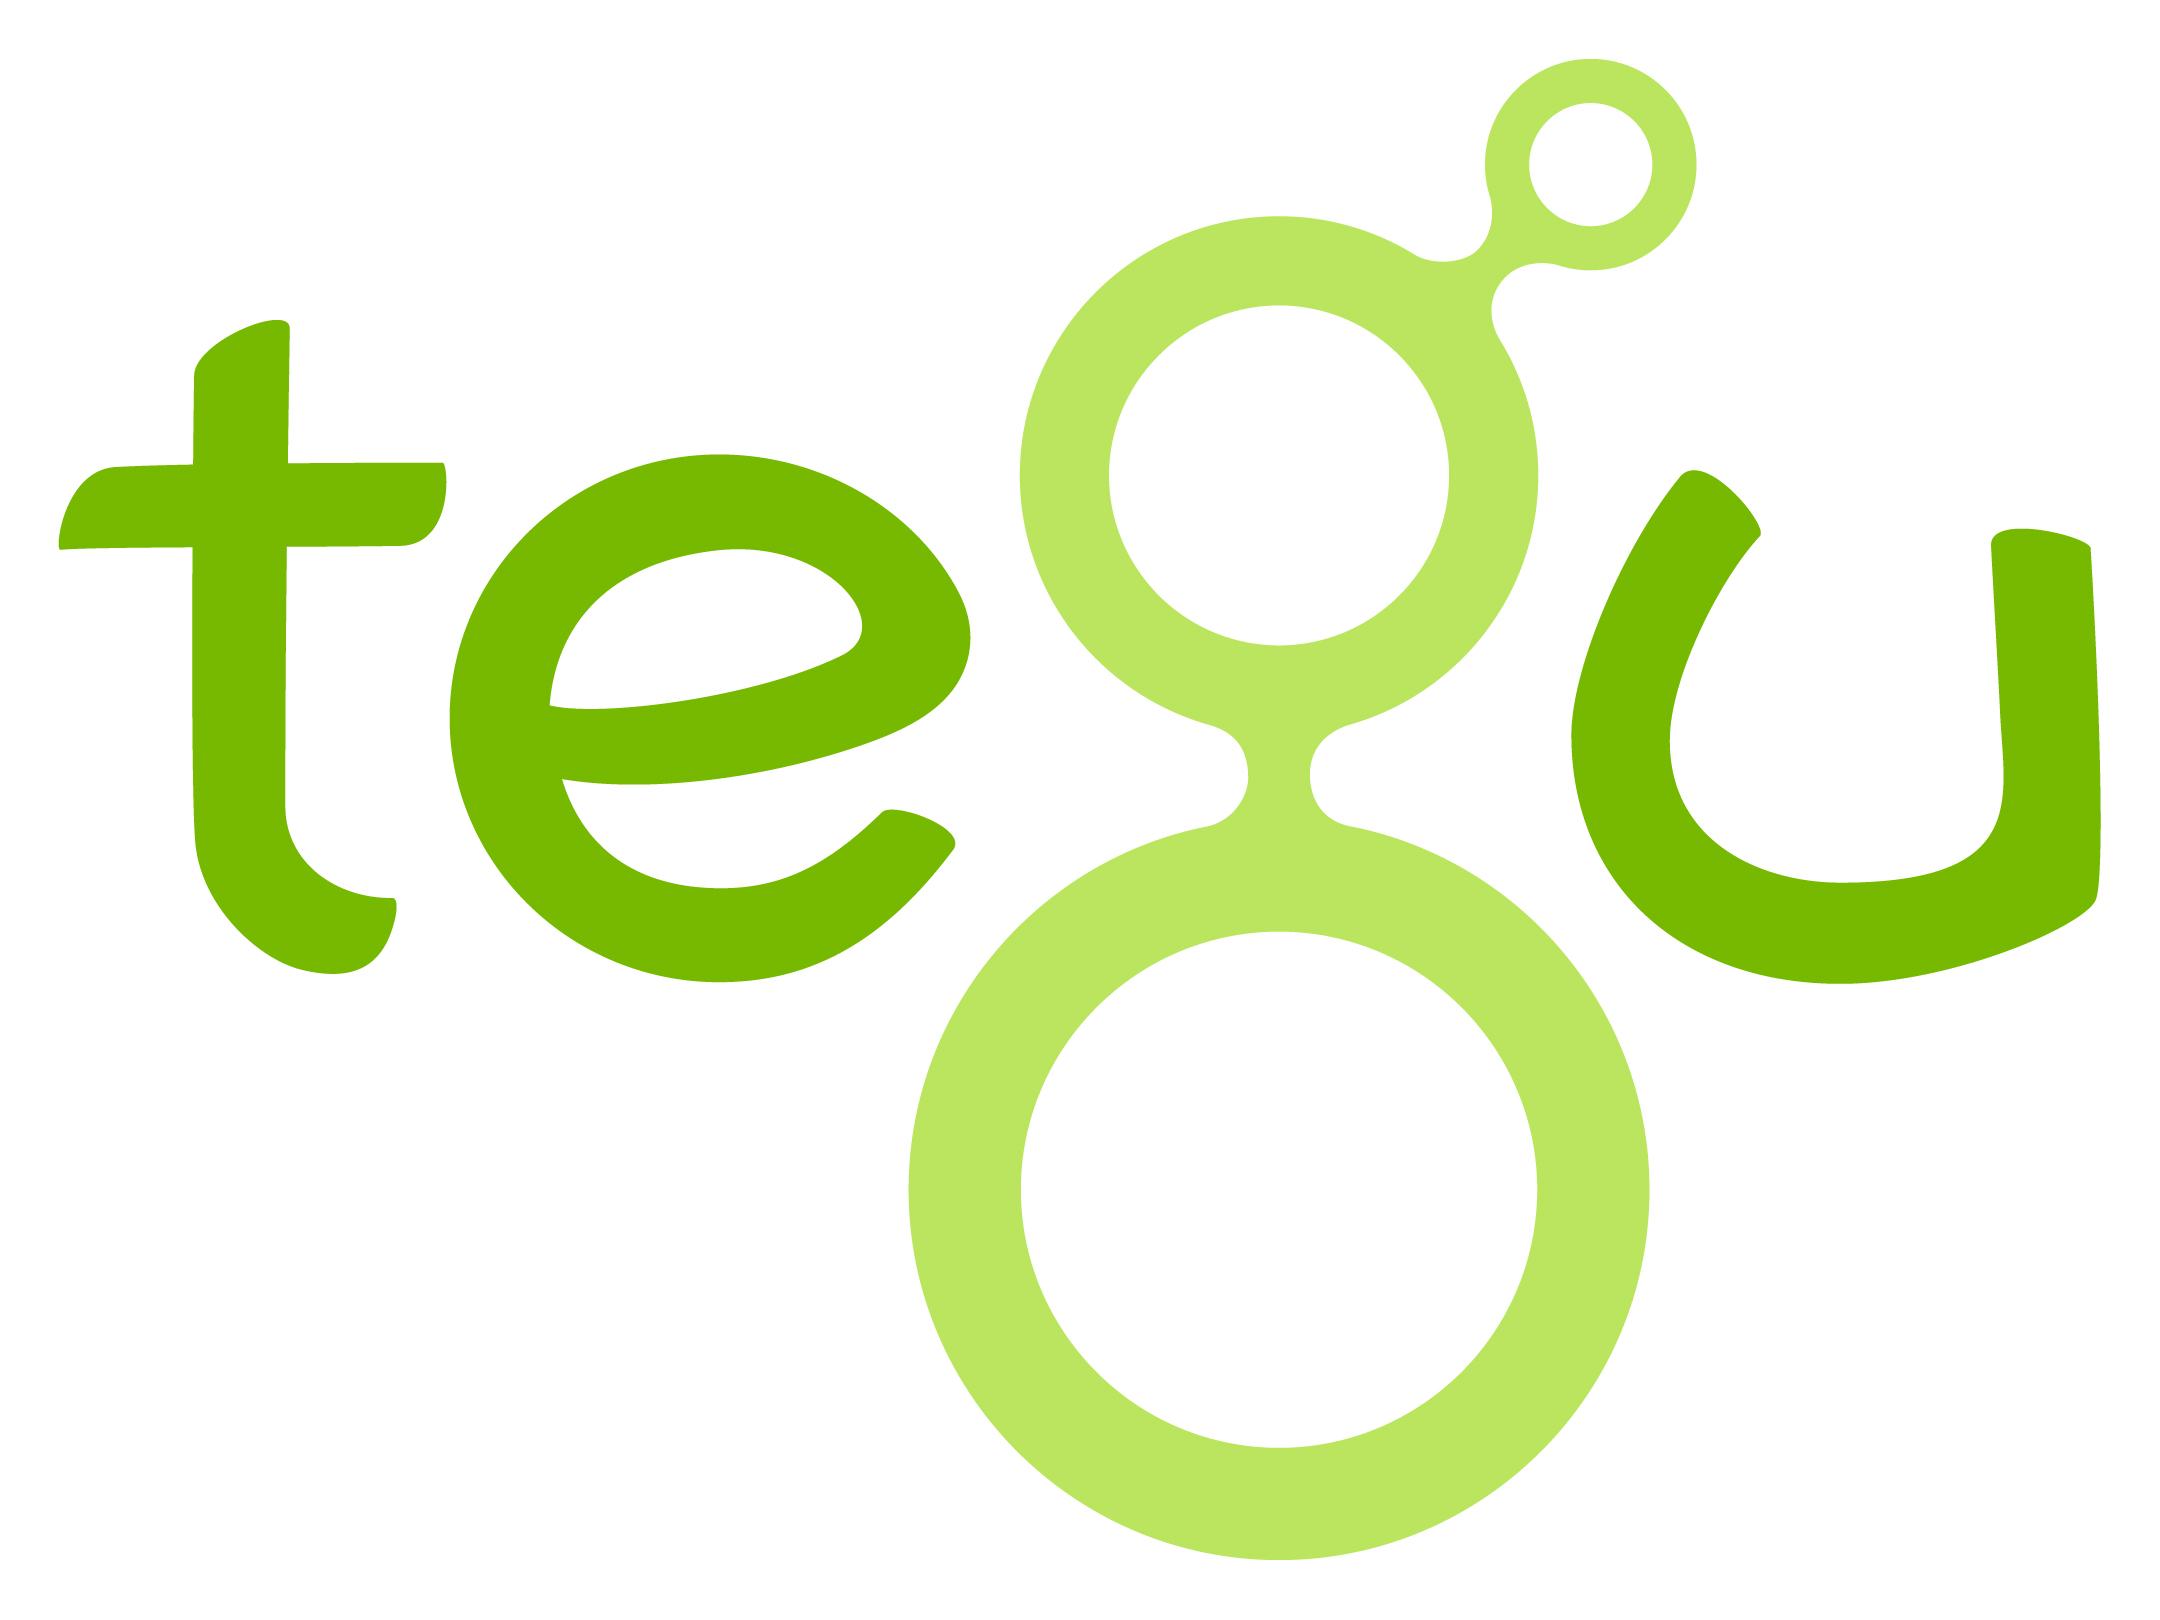 logo green green